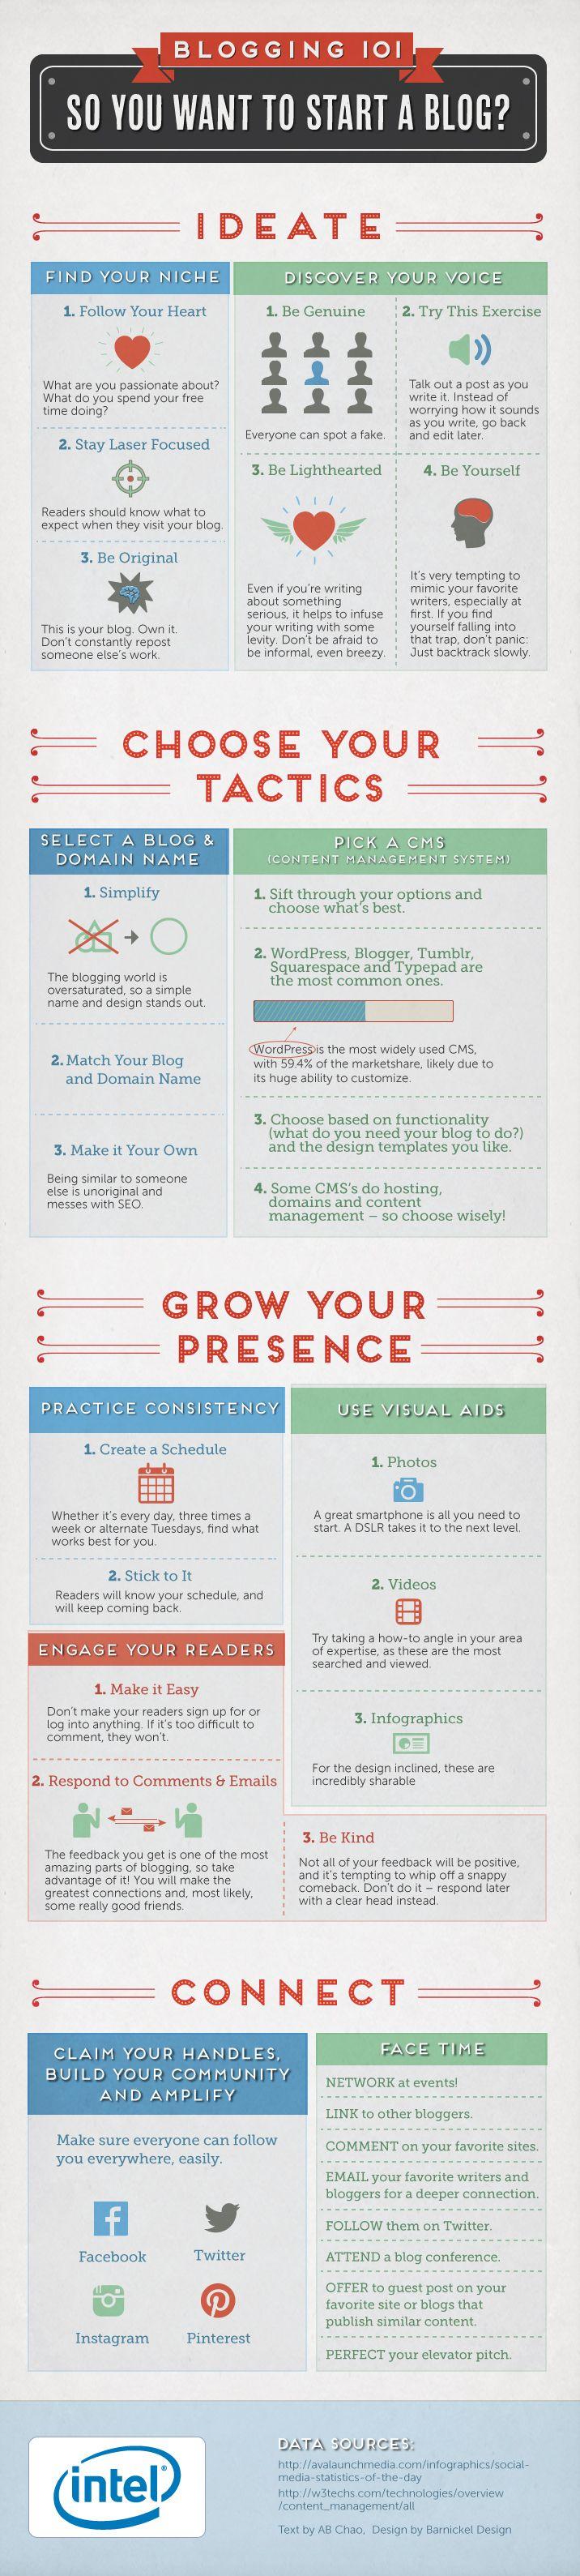 For more blogging tips visit http://viviennekneale.com/ via @conte